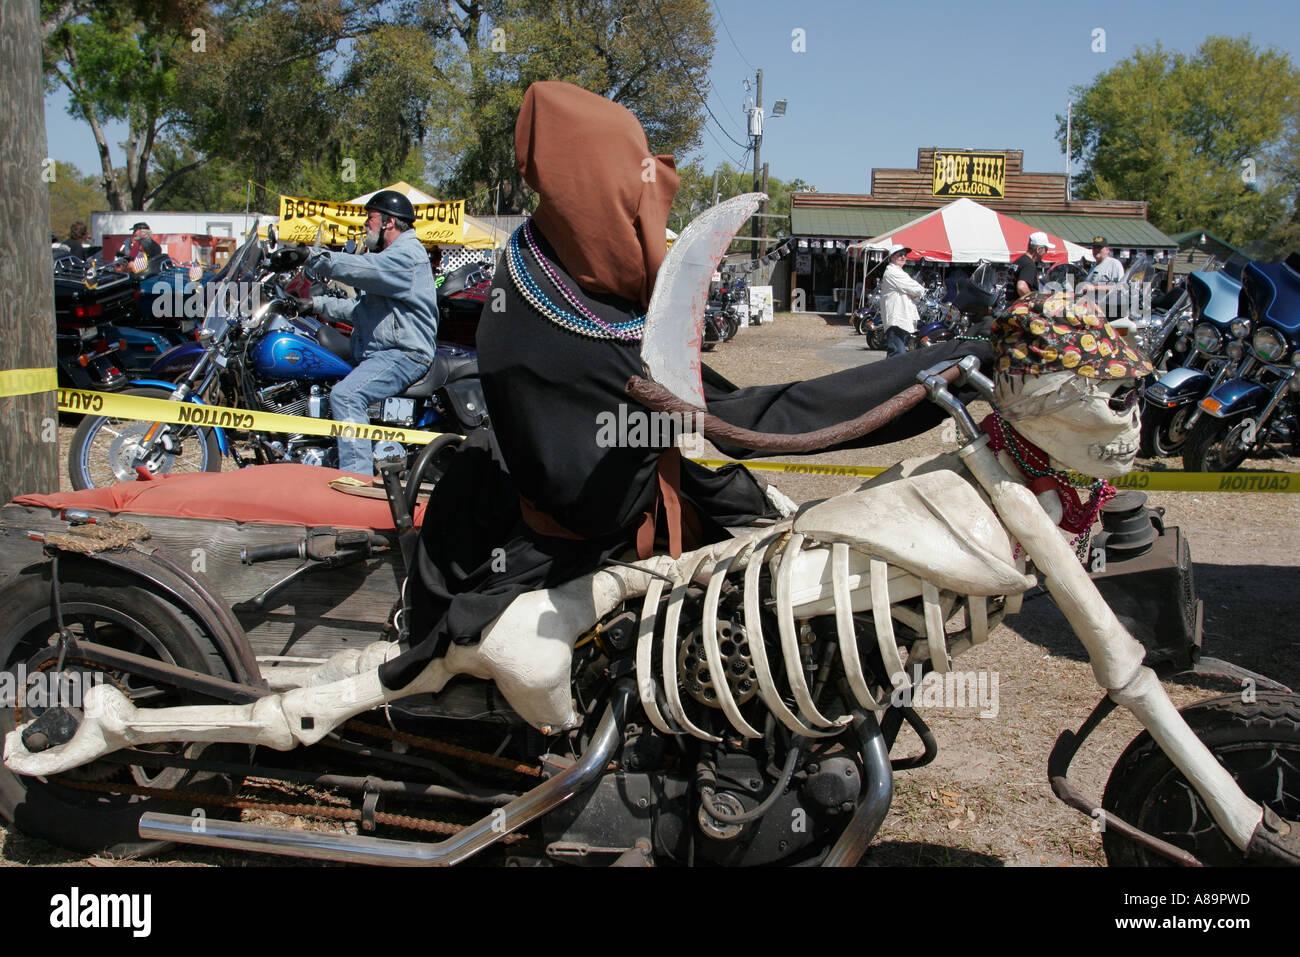 Daytona Beach Motorcycle Rally